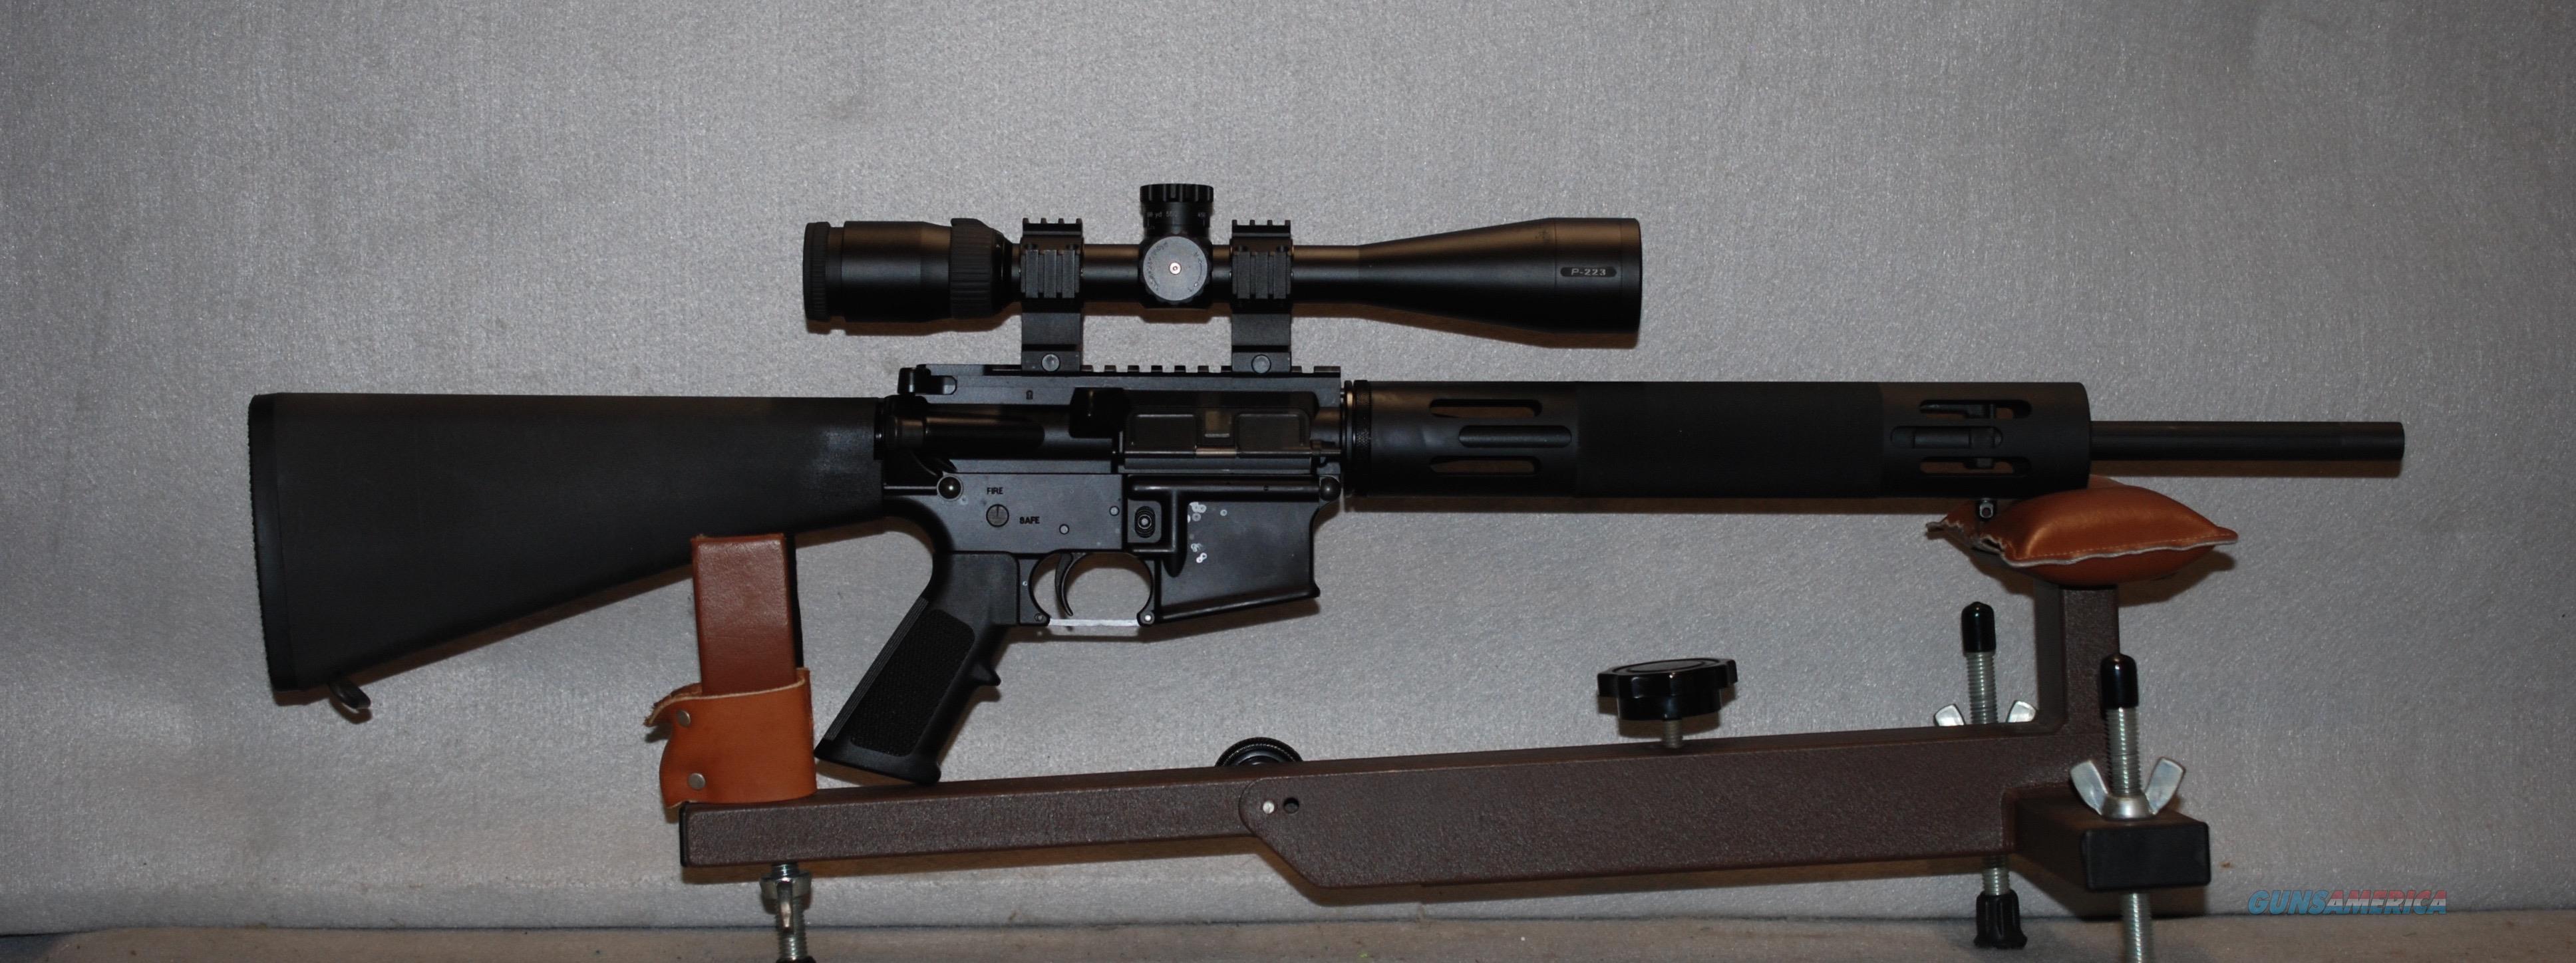 "AR 15 ""sniper"" Bushmaster with scope"